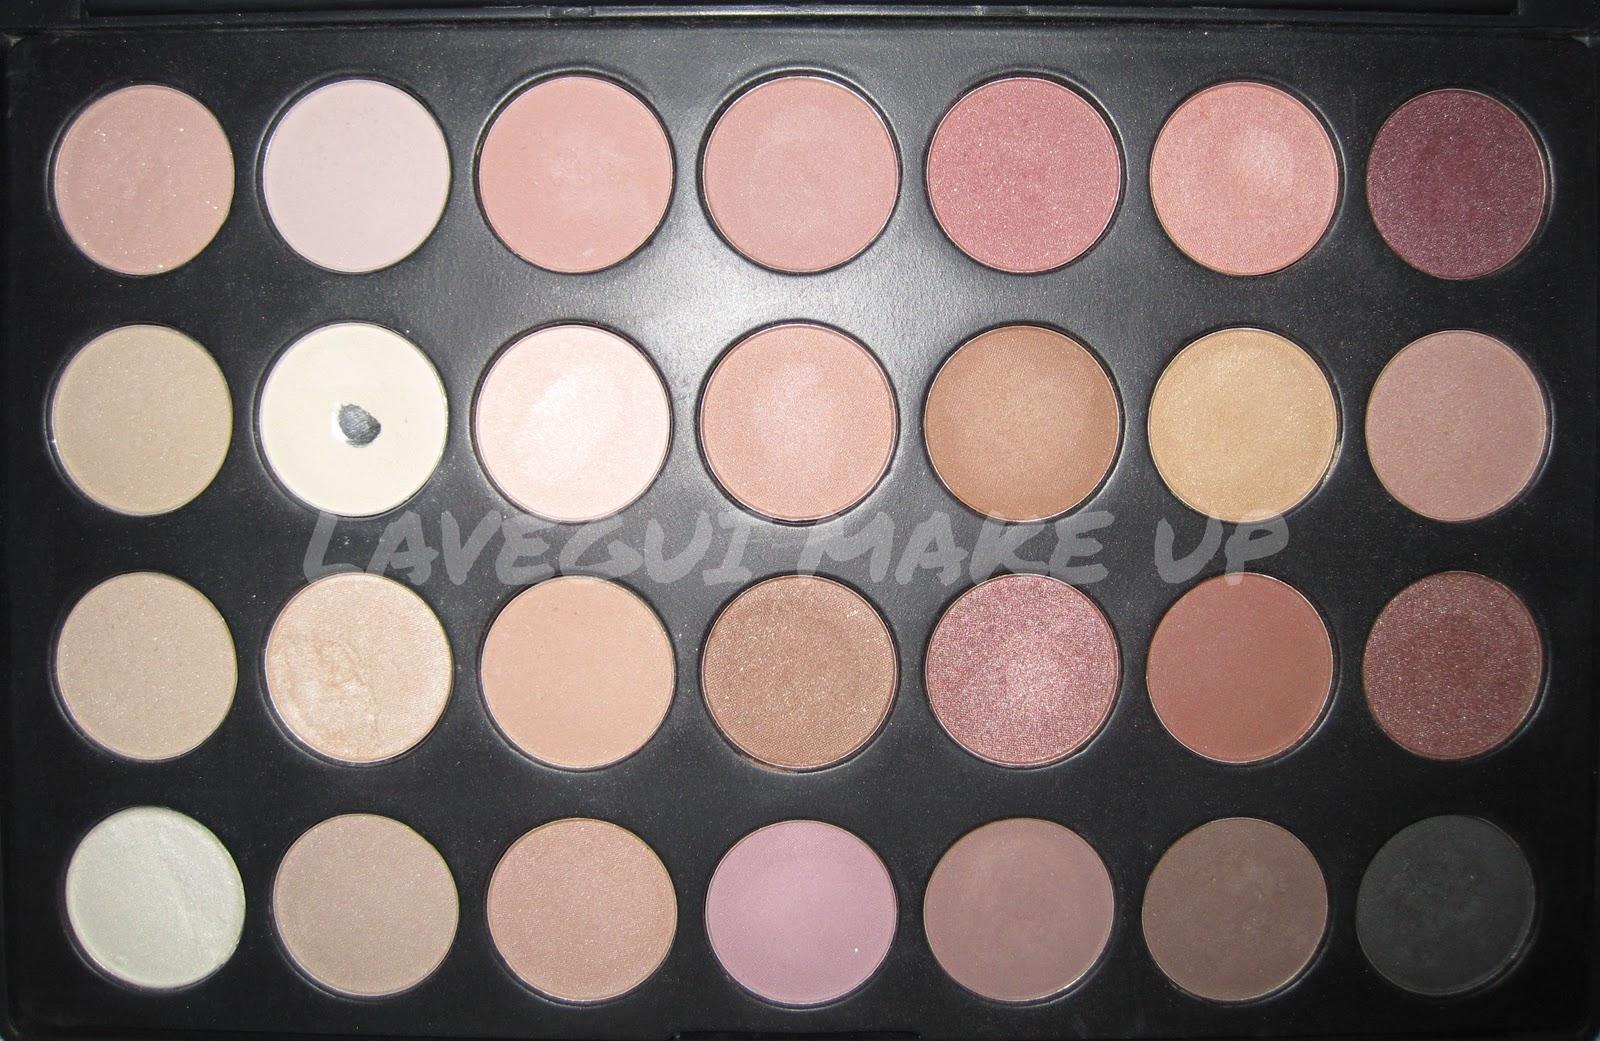 Lavegui make up paleta 28 neutrales ebay vs sombras mac - Paleta de colores neutros ...